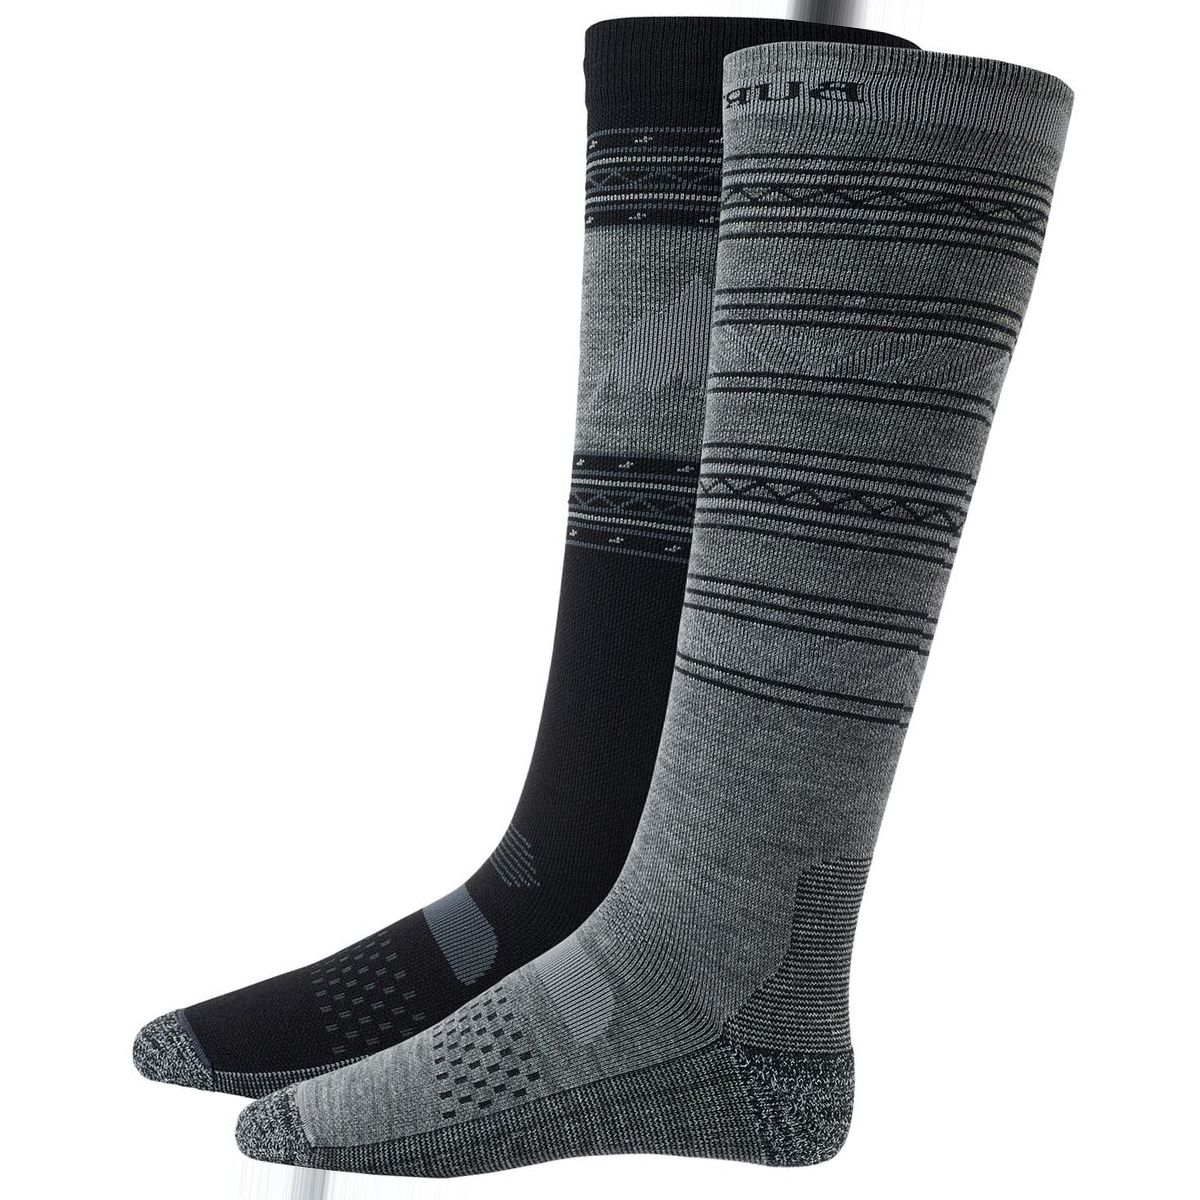 Burton Performance Lightweight Sock - 2-Pack - Men's